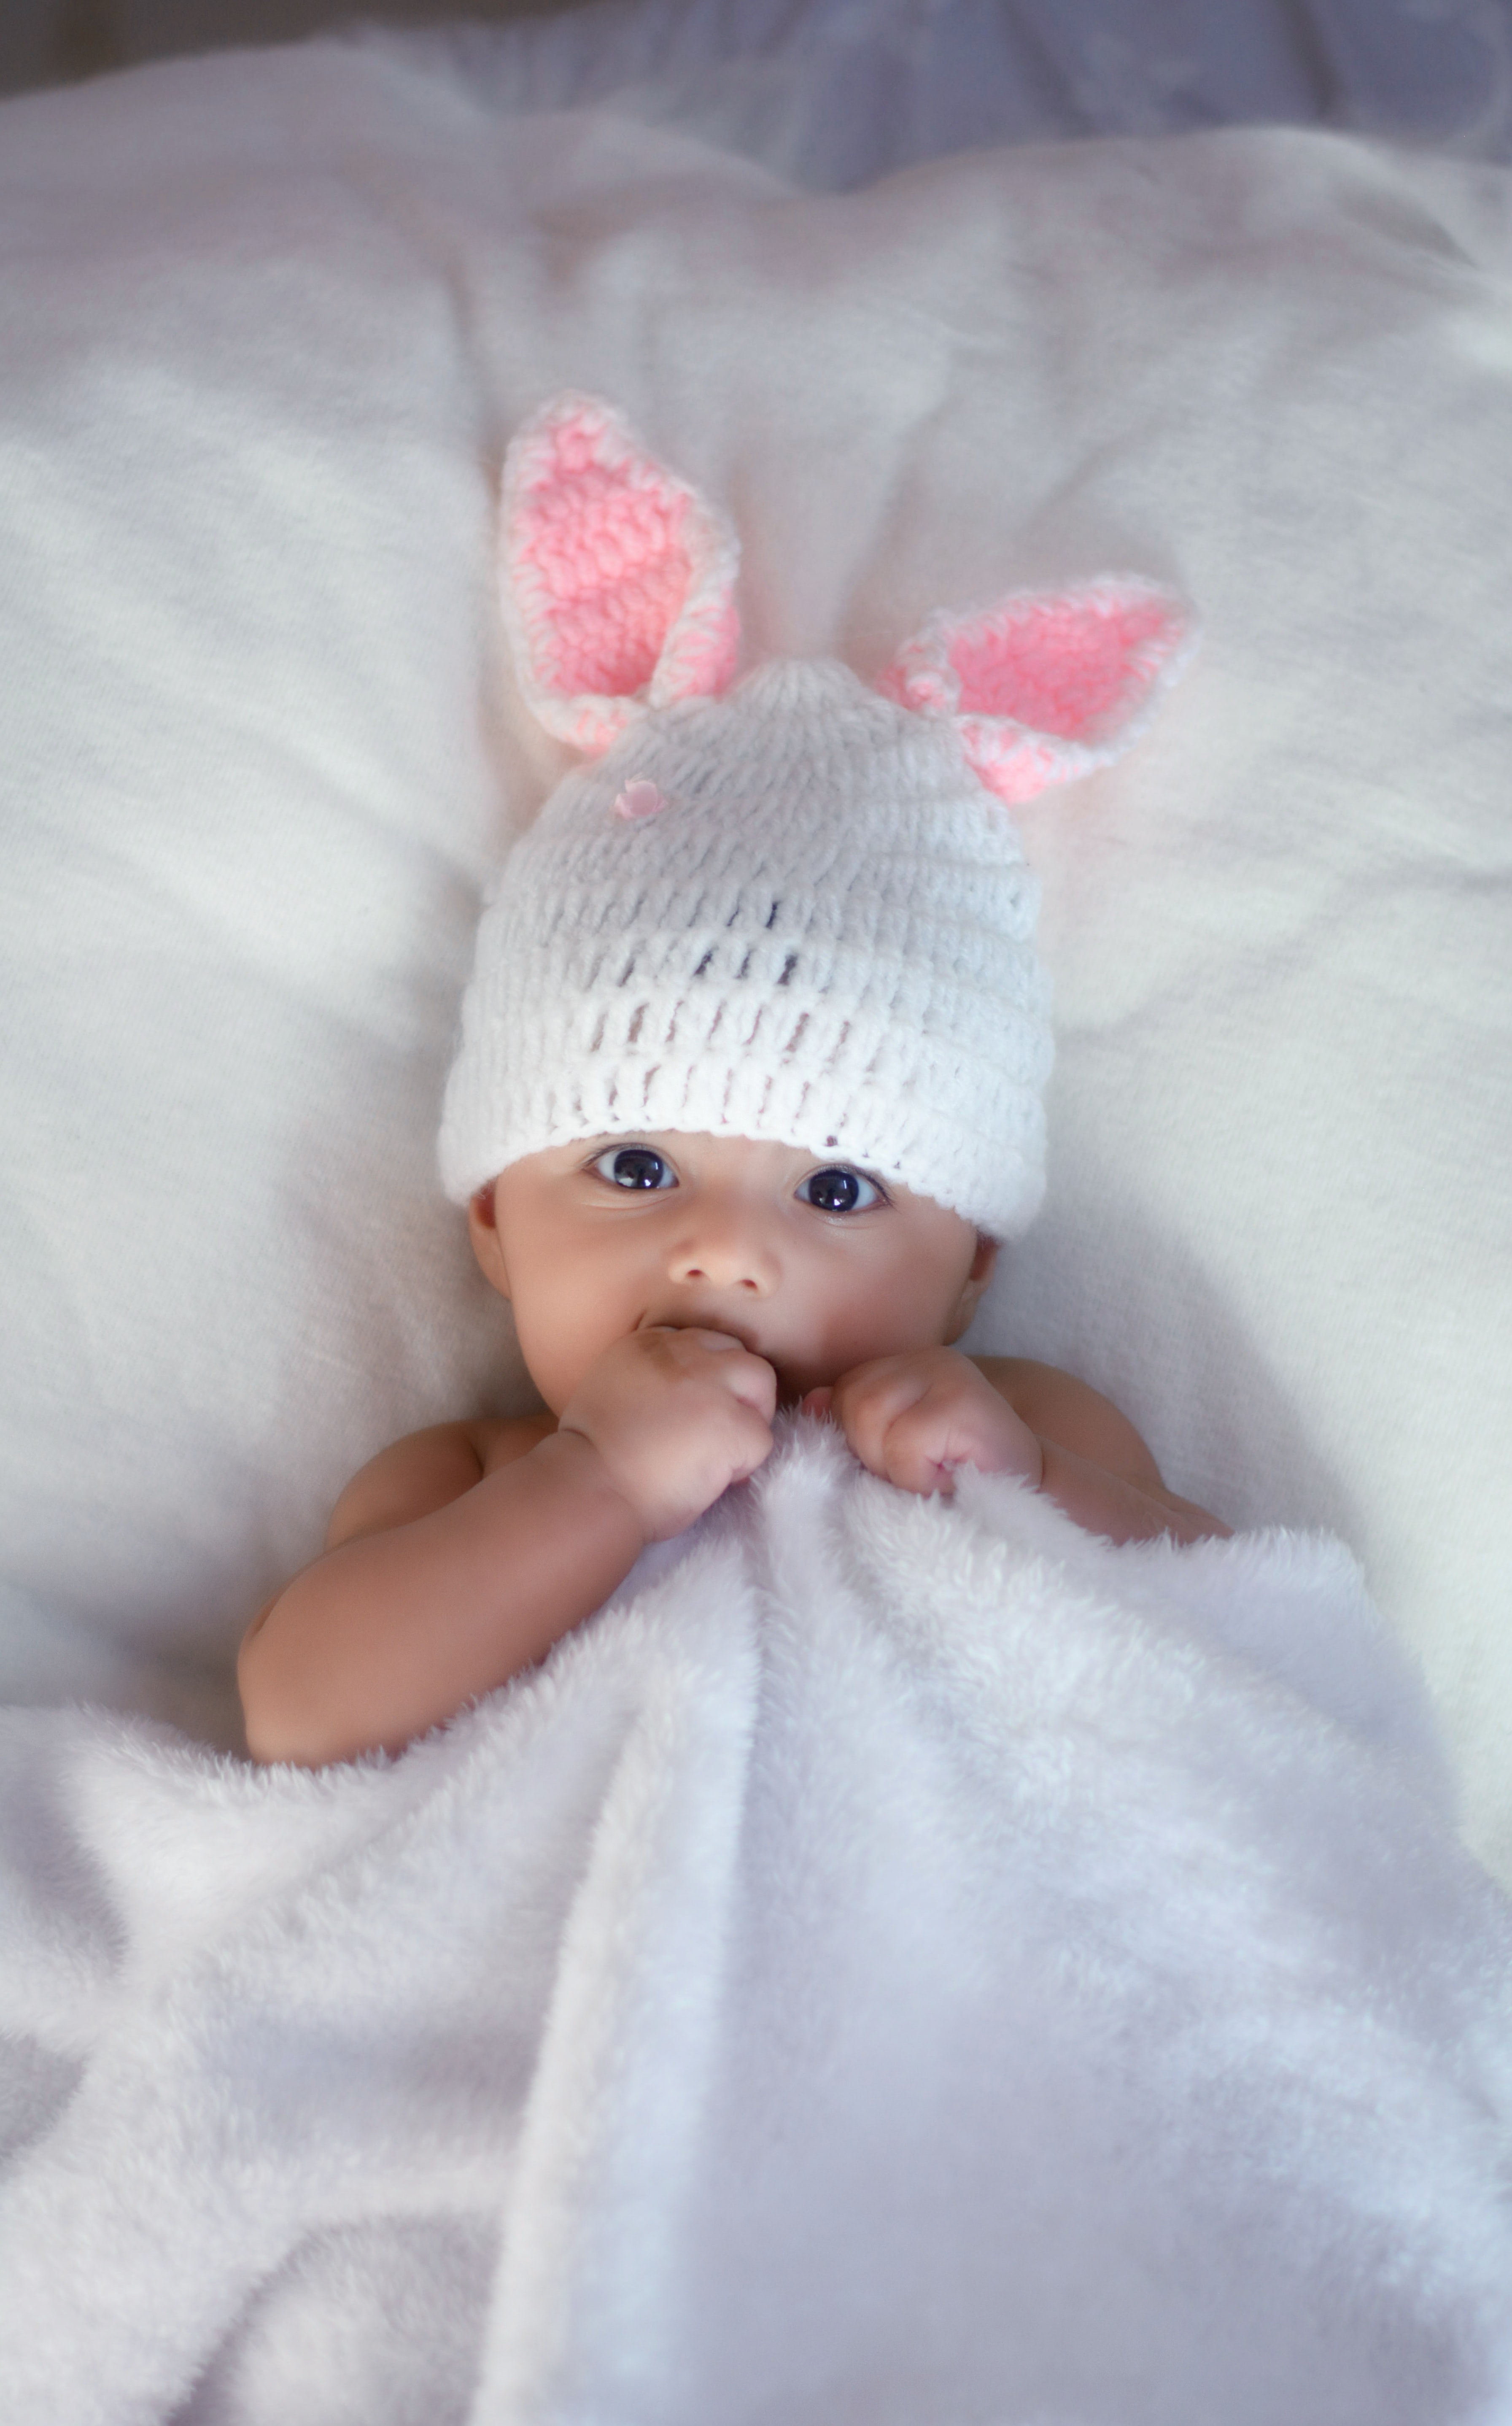 वेलकम बेबी